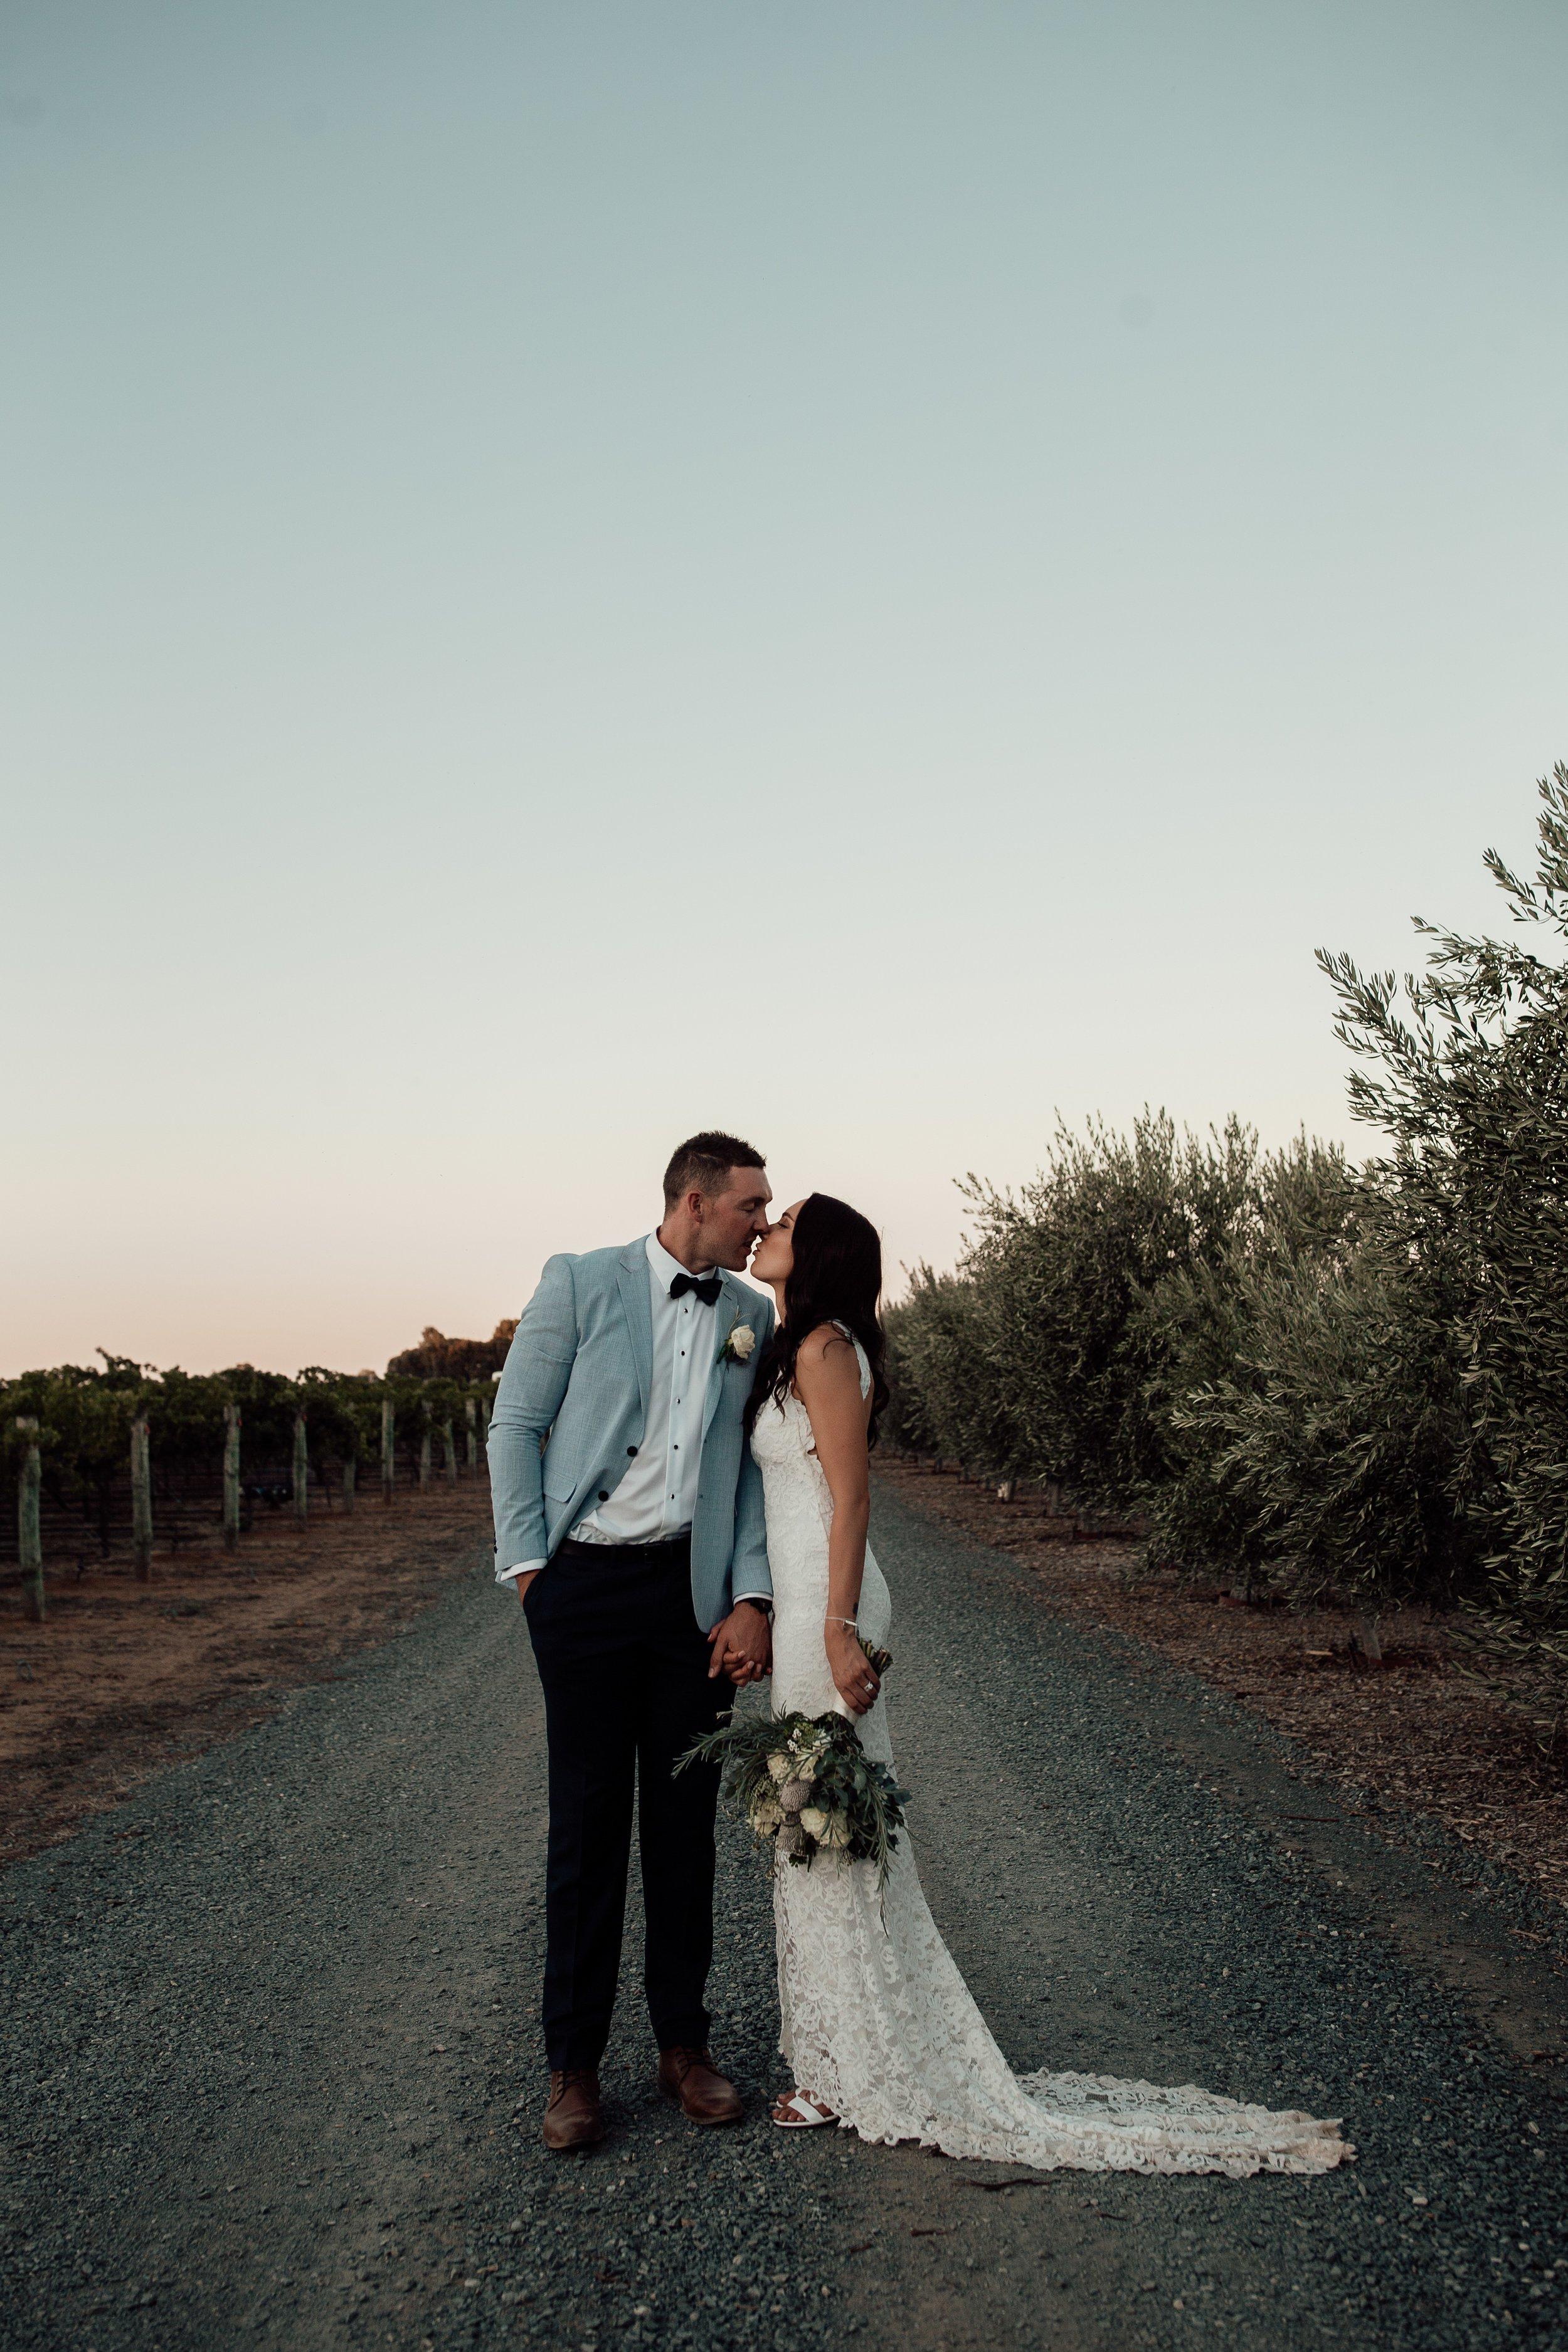 mickalathomas_puremacphotography_weddingphotographer_couplephotographer_Sheppartonphotographer_2927.jpg